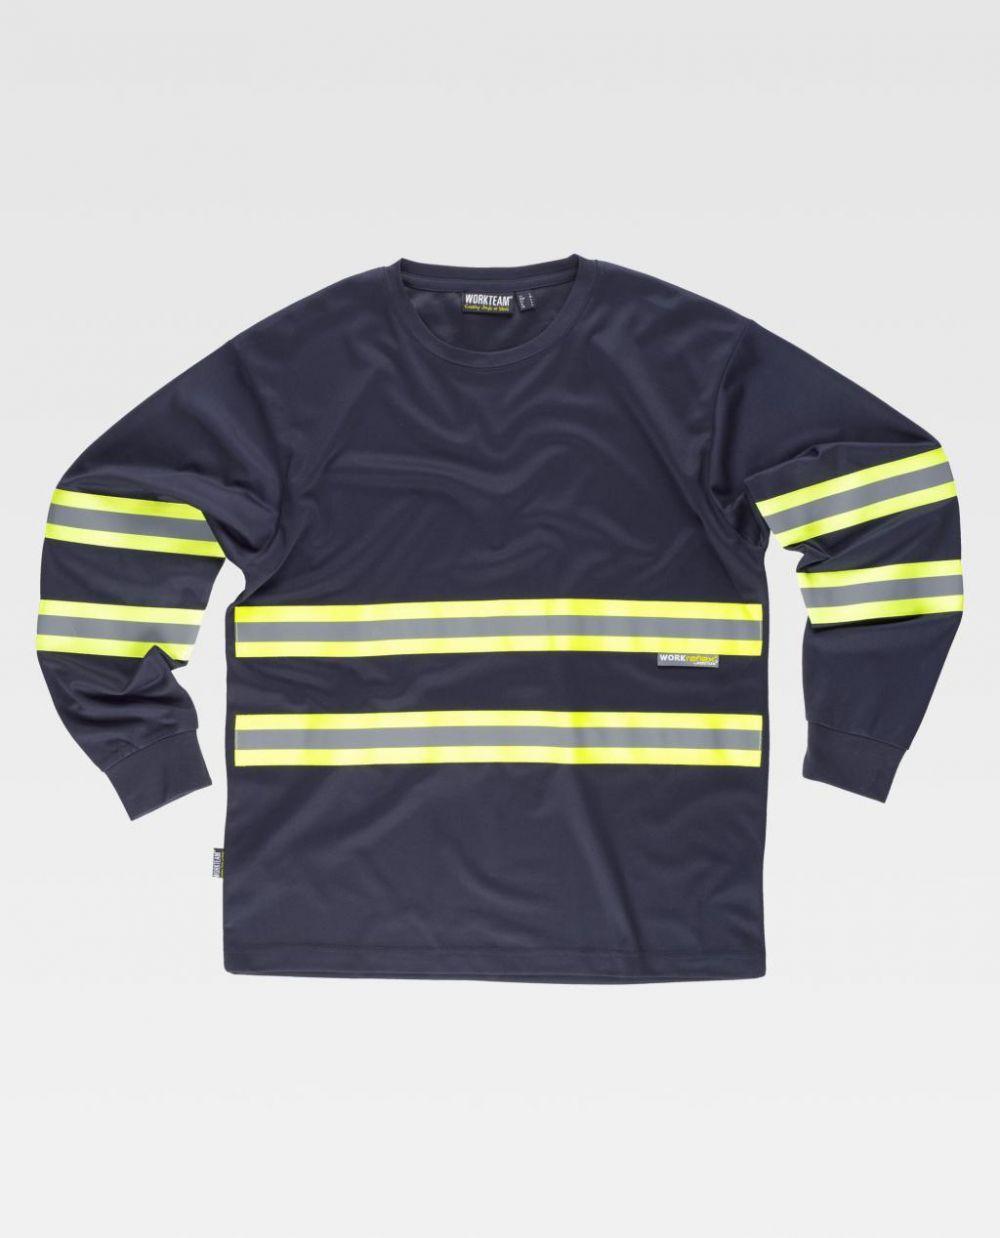 Camisetas reflectante workteam ml tejido pique de poliéster vista 1